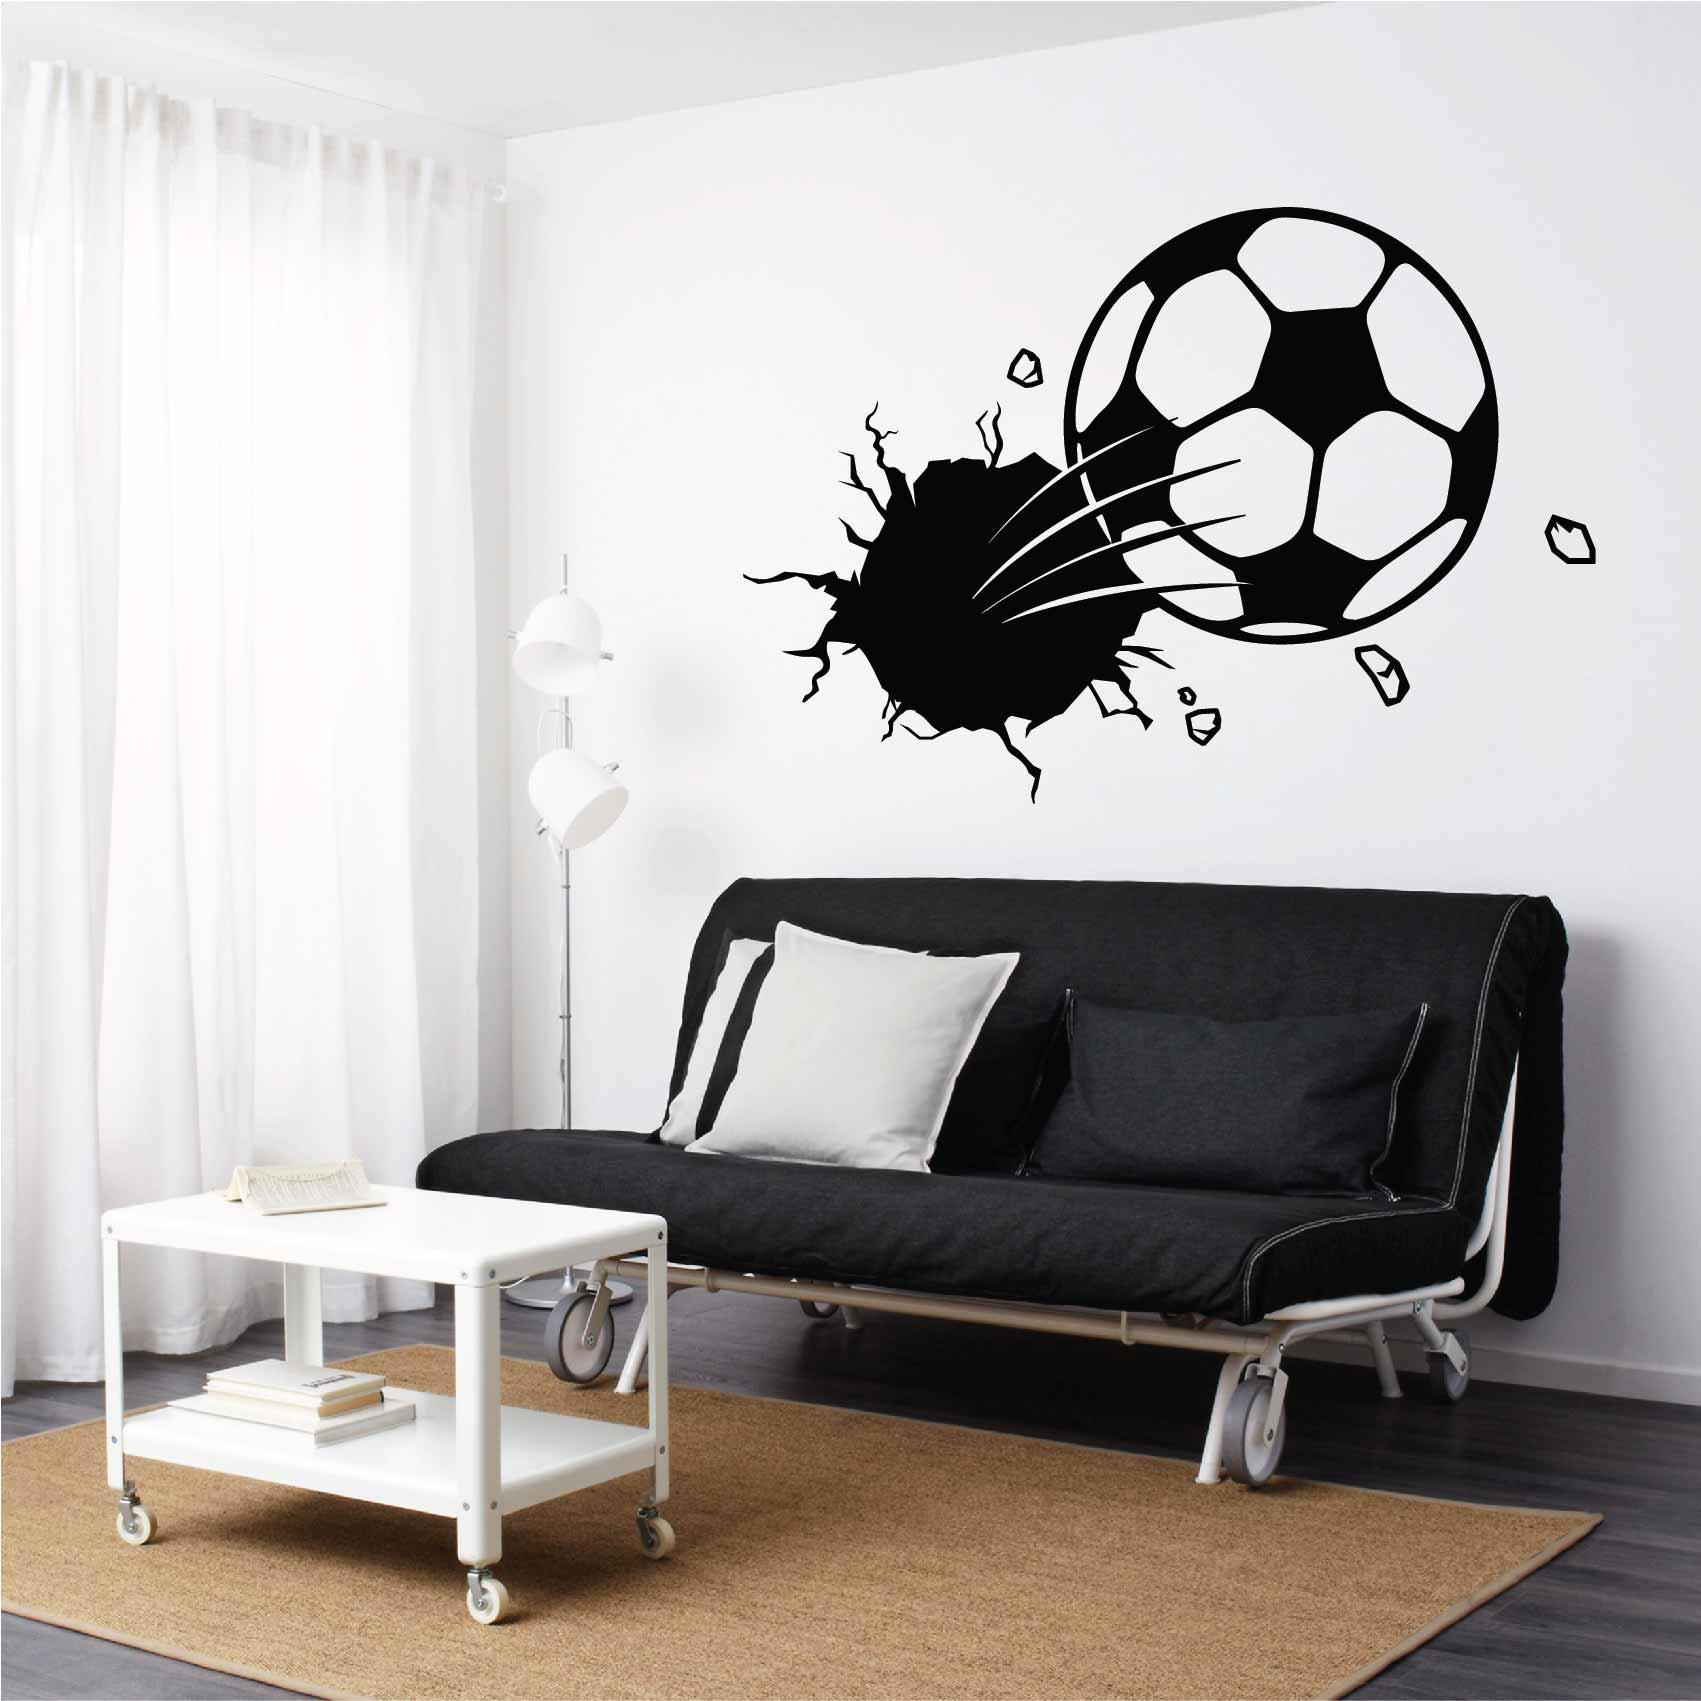 Stickers Ballon Foot